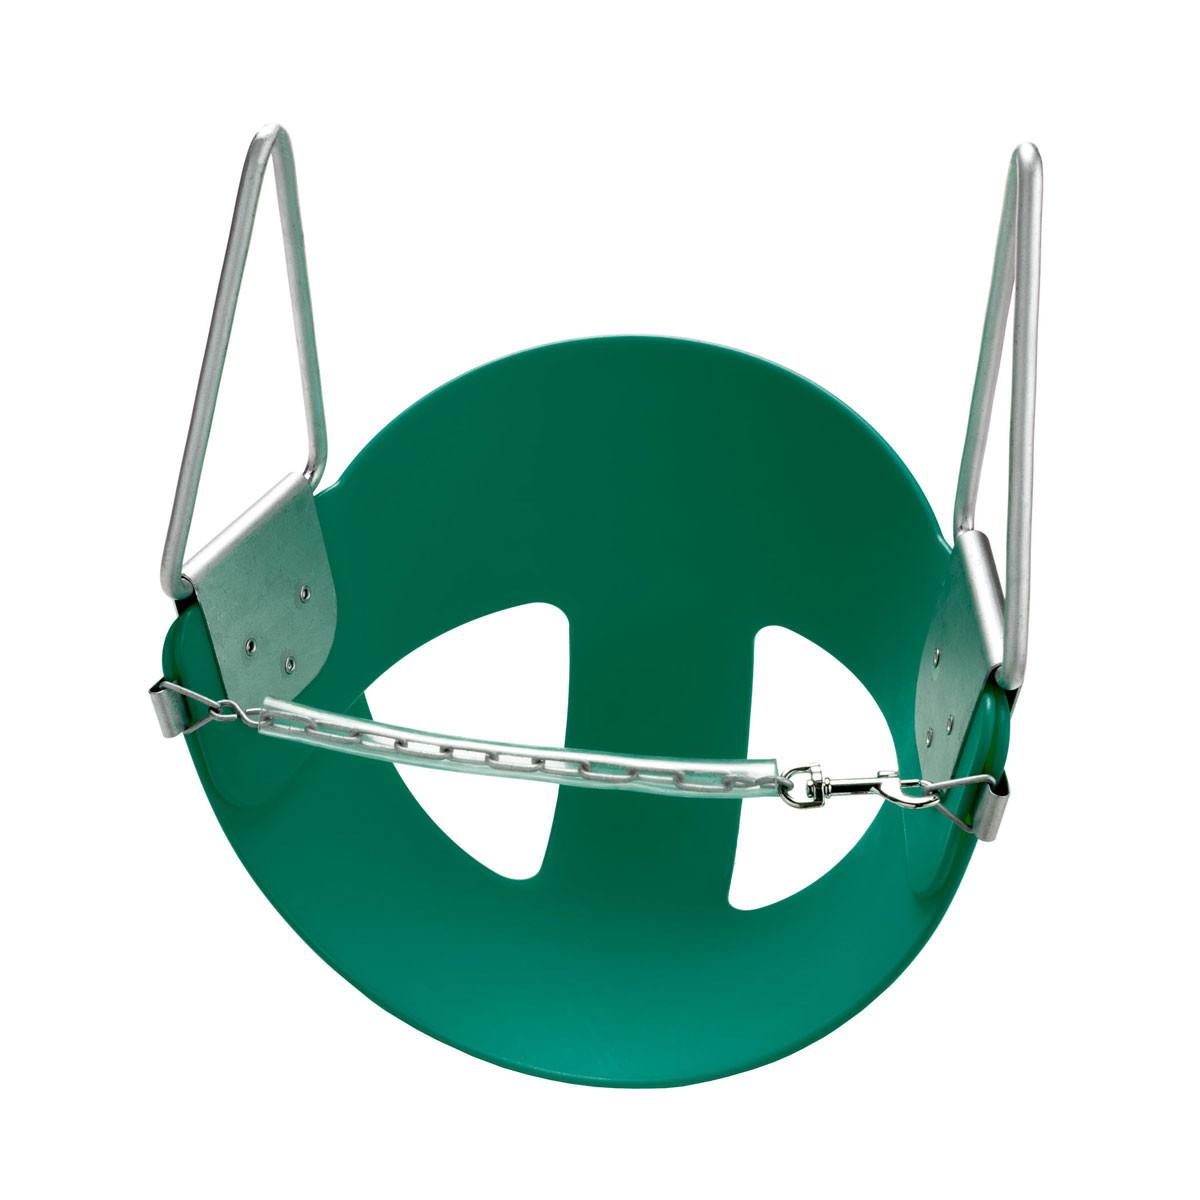 CoPoly Half Bucket Swing Seat - Green